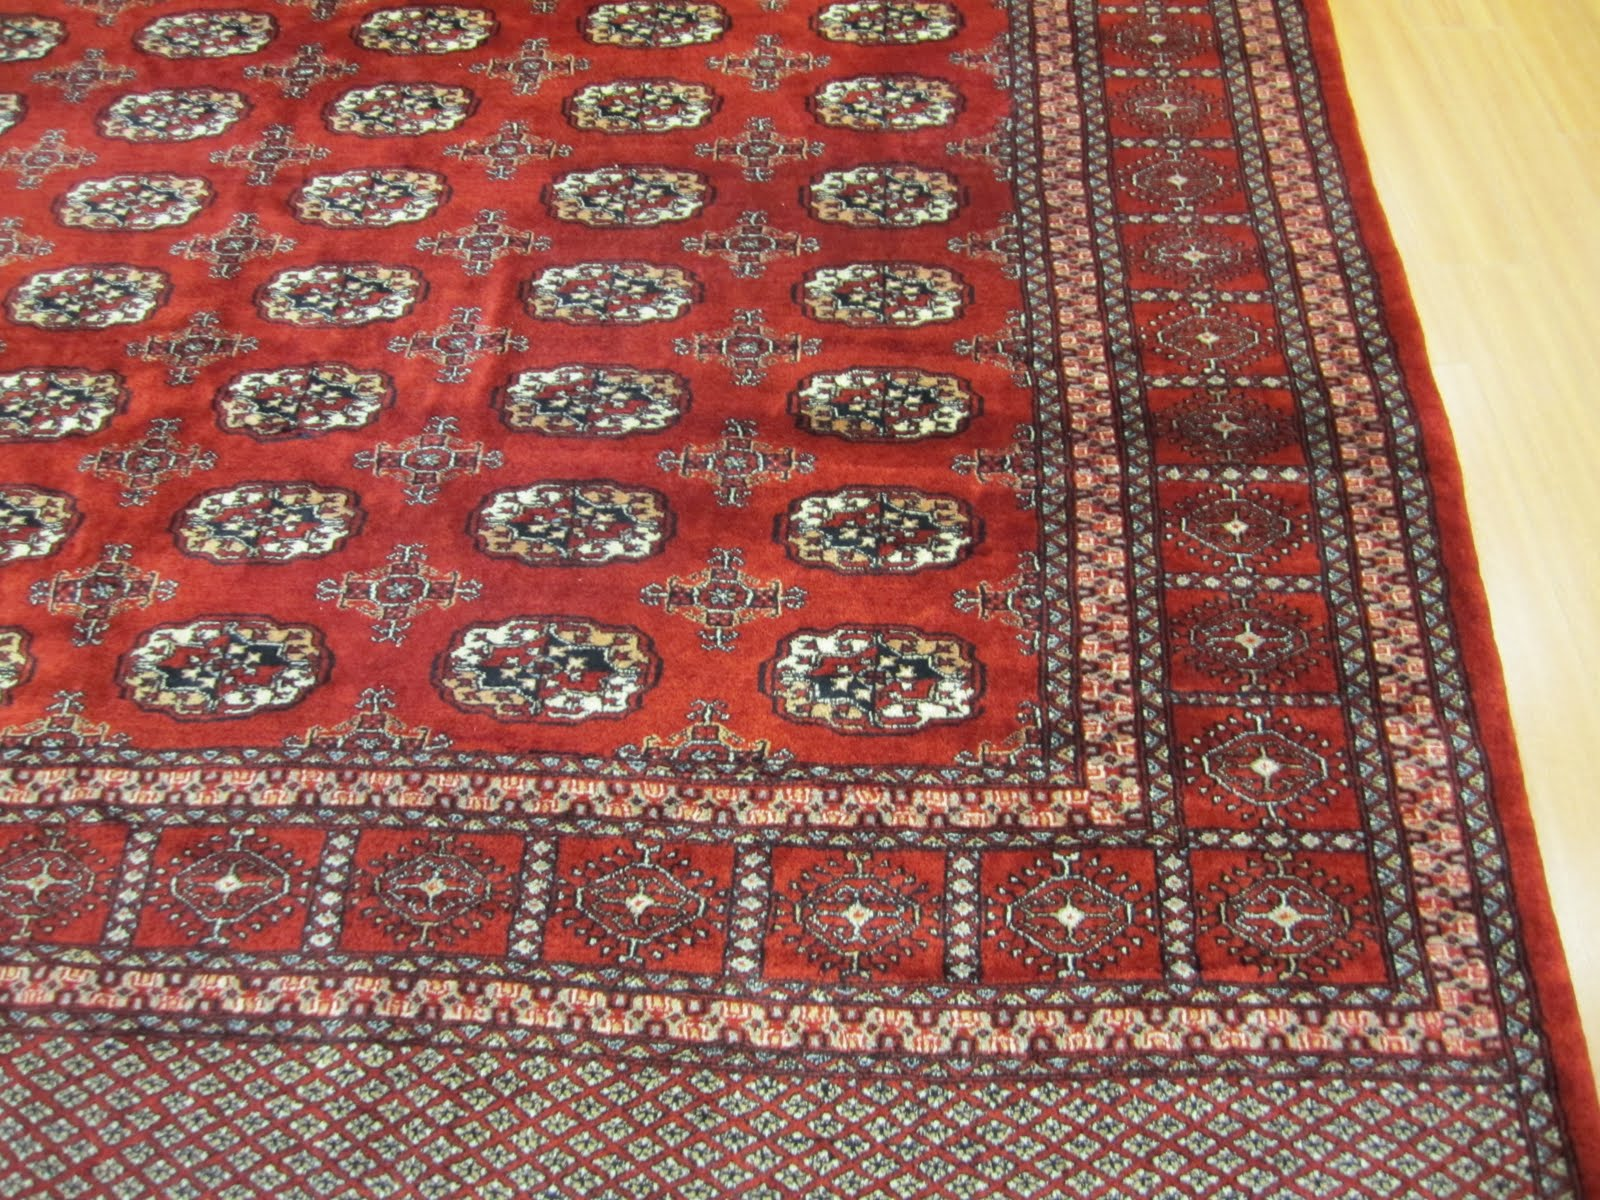 Bokhara Carpets Carpet Vidalondon